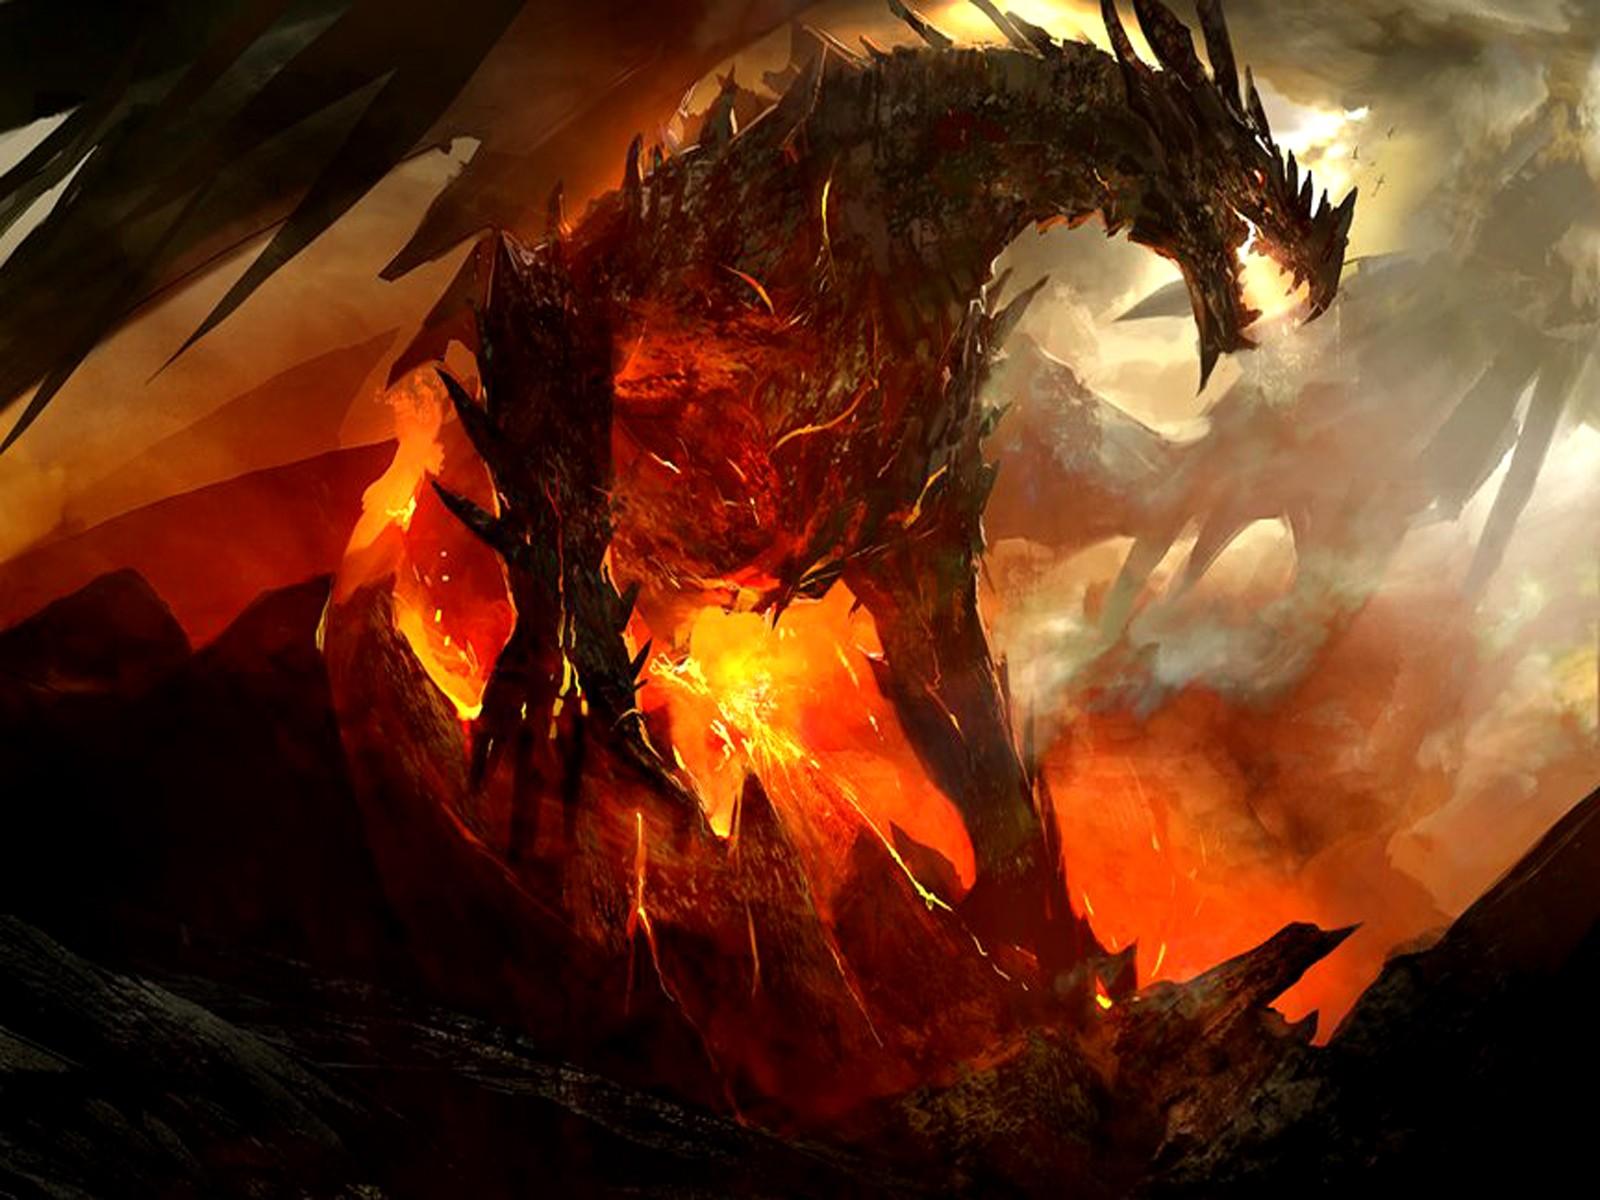 Dragons Fire Wallpaper 1600x1200 Dragons Fire Volcanoes Fantasy 1600x1200